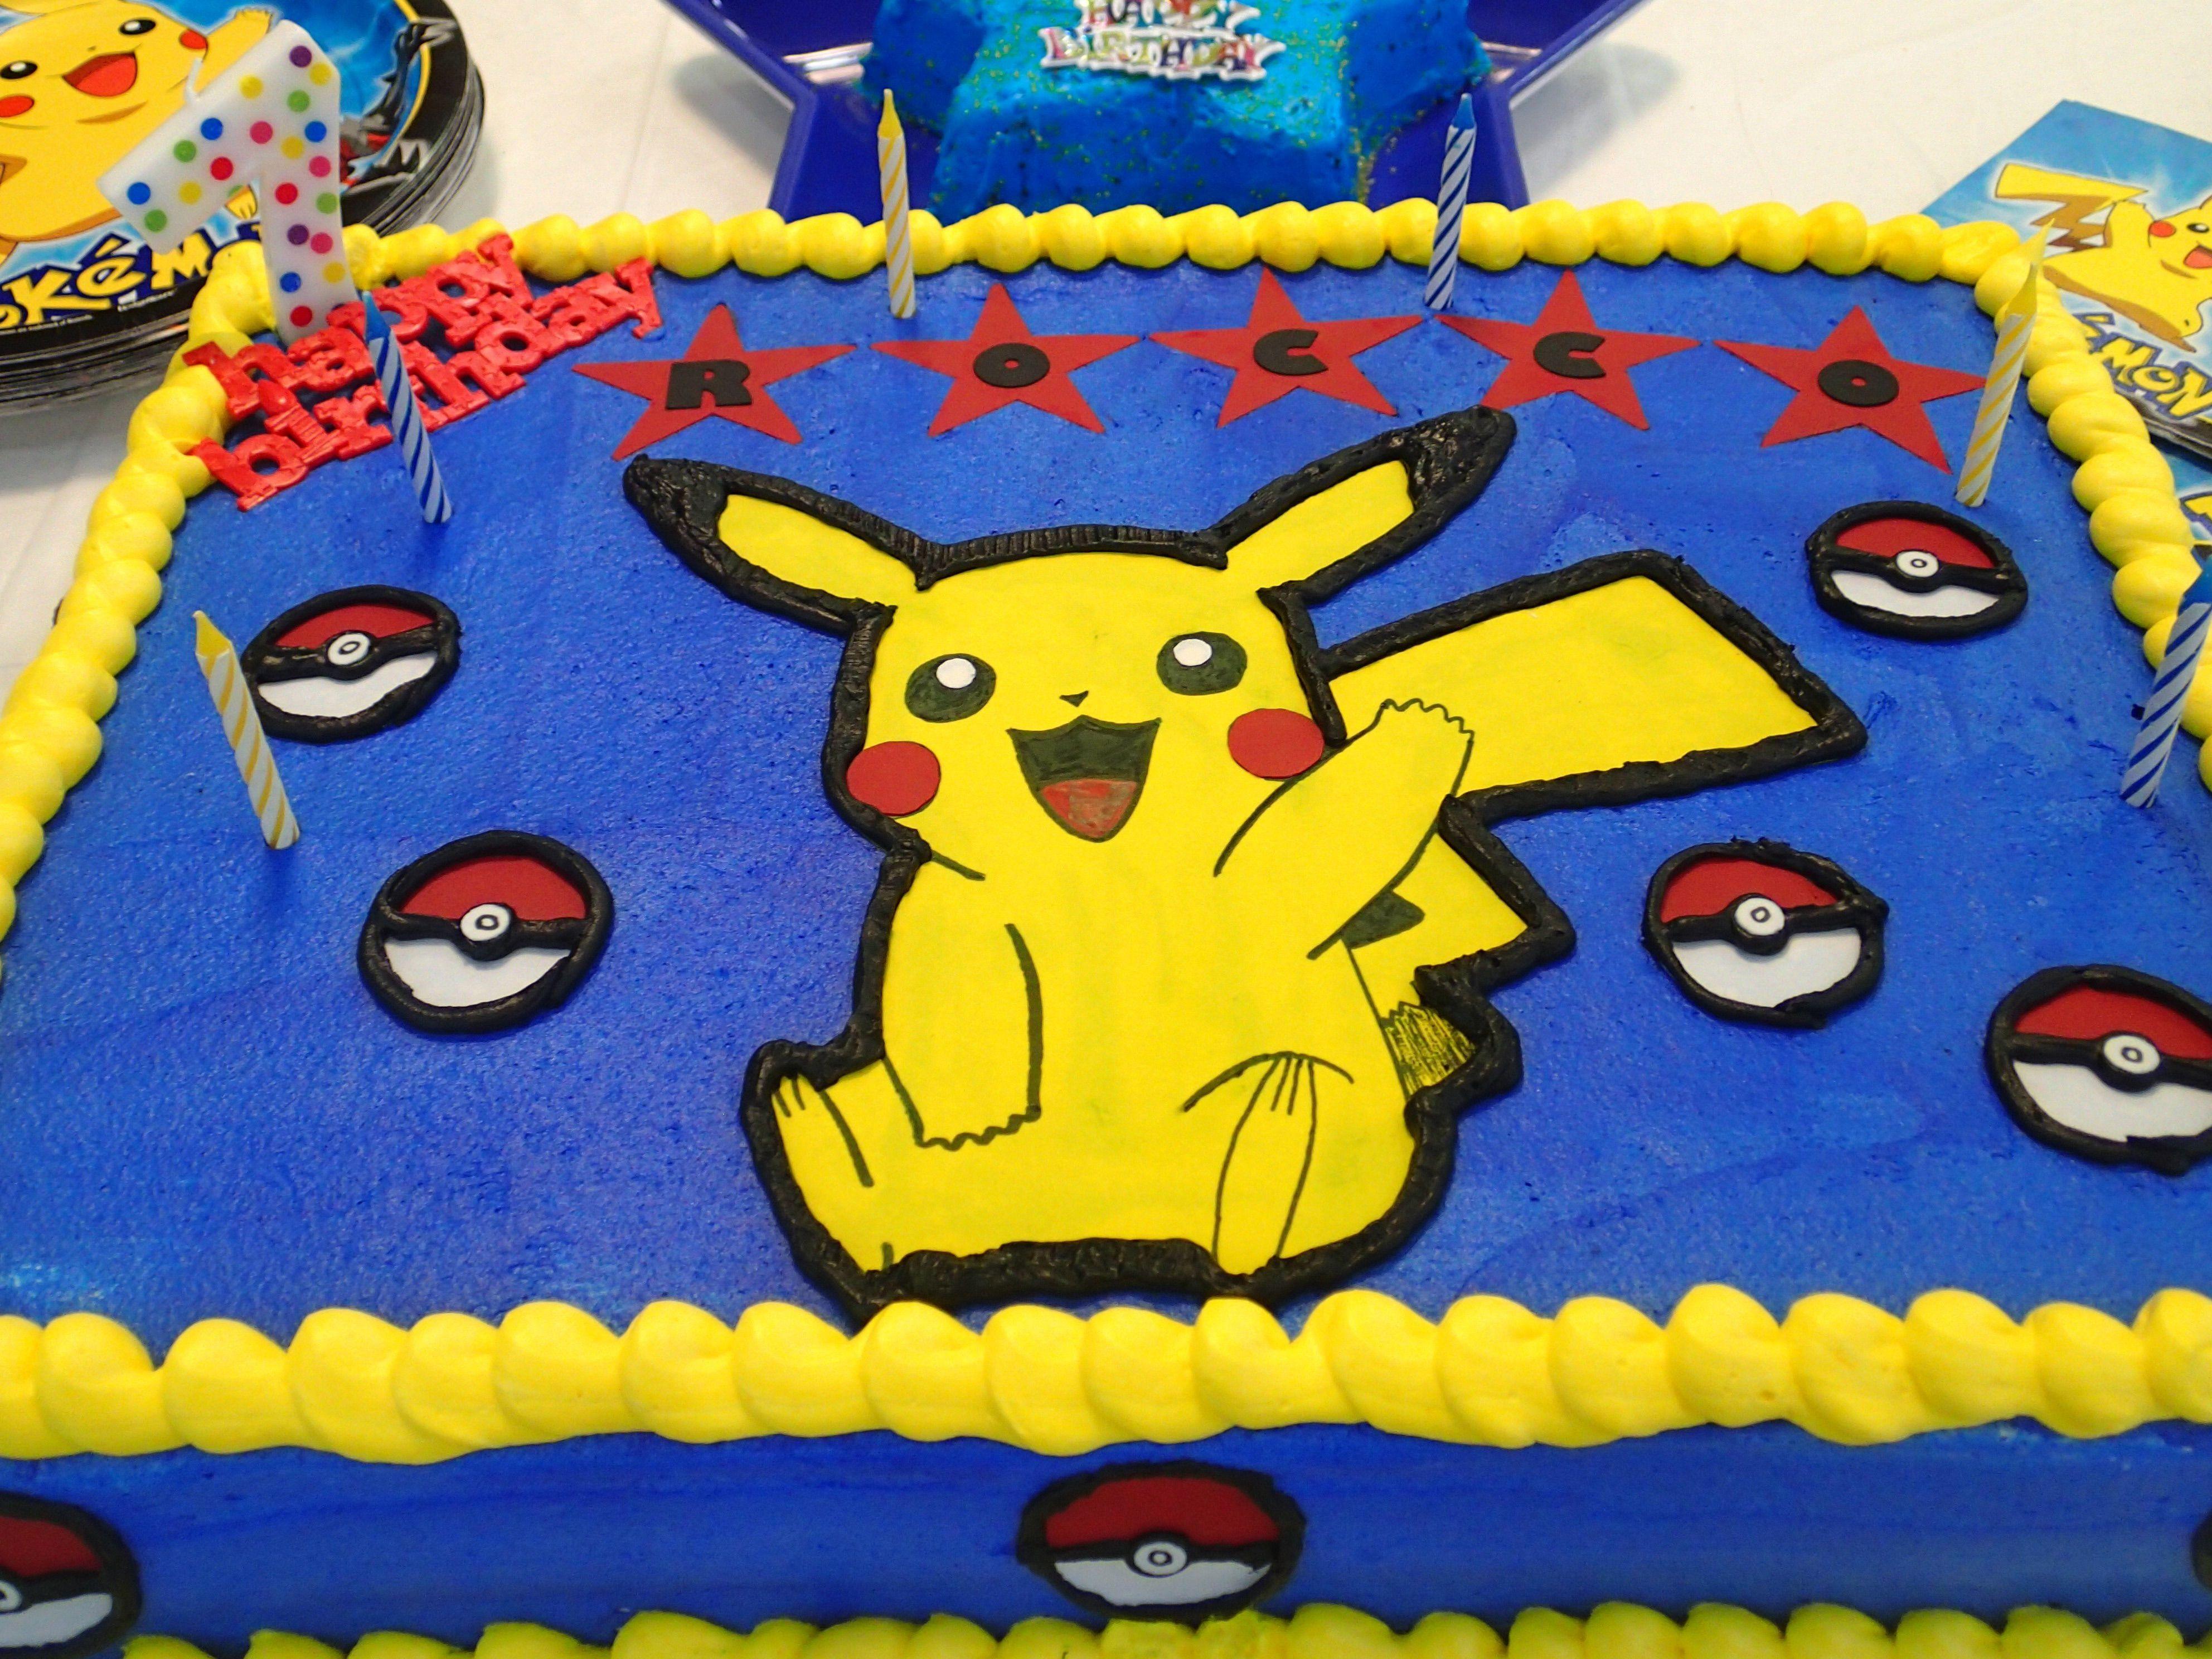 Pokemon Sugar Sheets For Cake Decorating